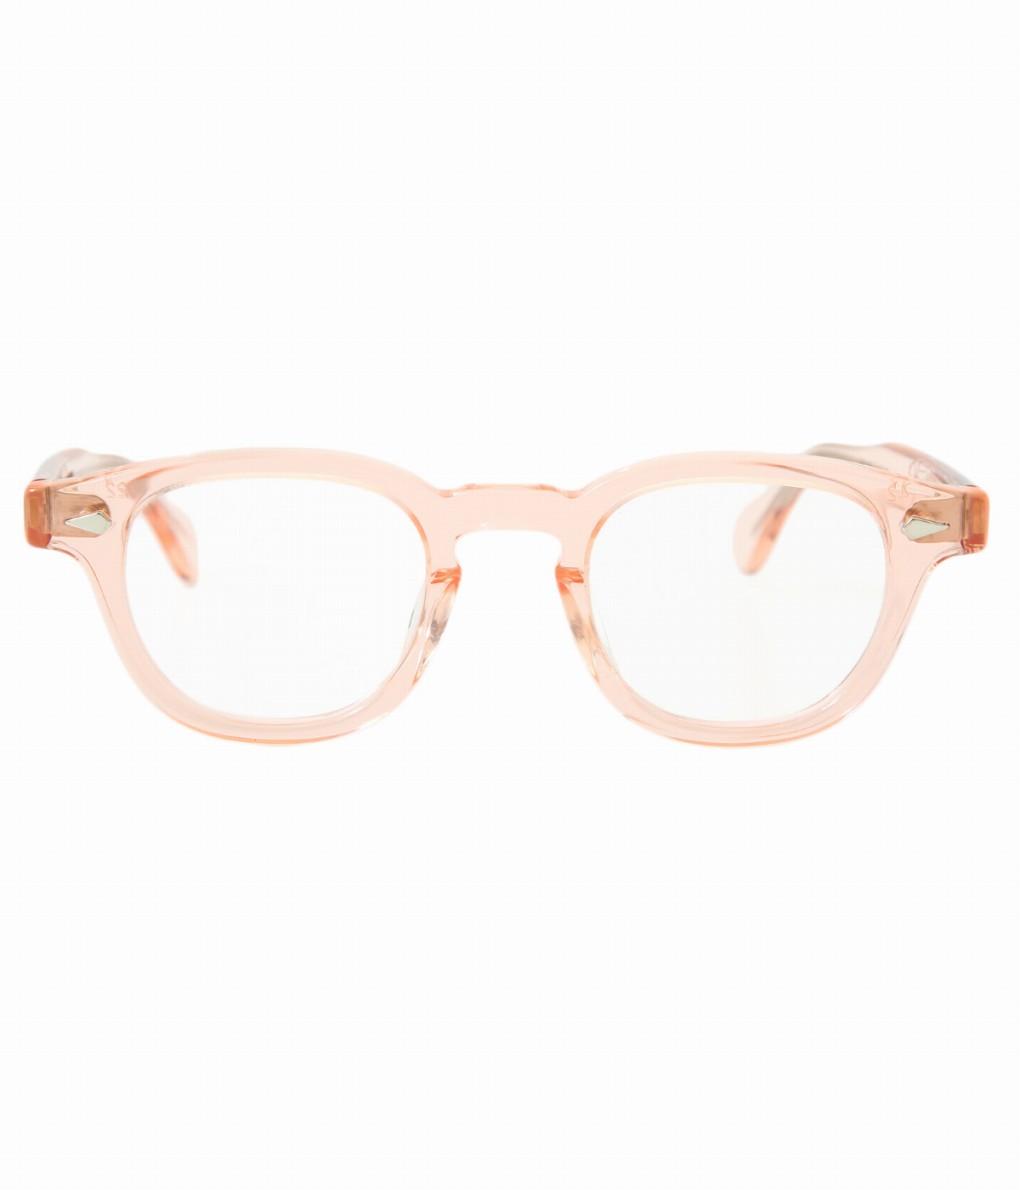 JULIUS TART OPTICAL / ジュリアスタートオプティカル : AR 42(size) 44(size) 46(size) - FRESH PINK / CLEAR - : サングラス アクセサリー メガネ 眼鏡 メンズ : JTPL-009H-1H【WIS】【COR】